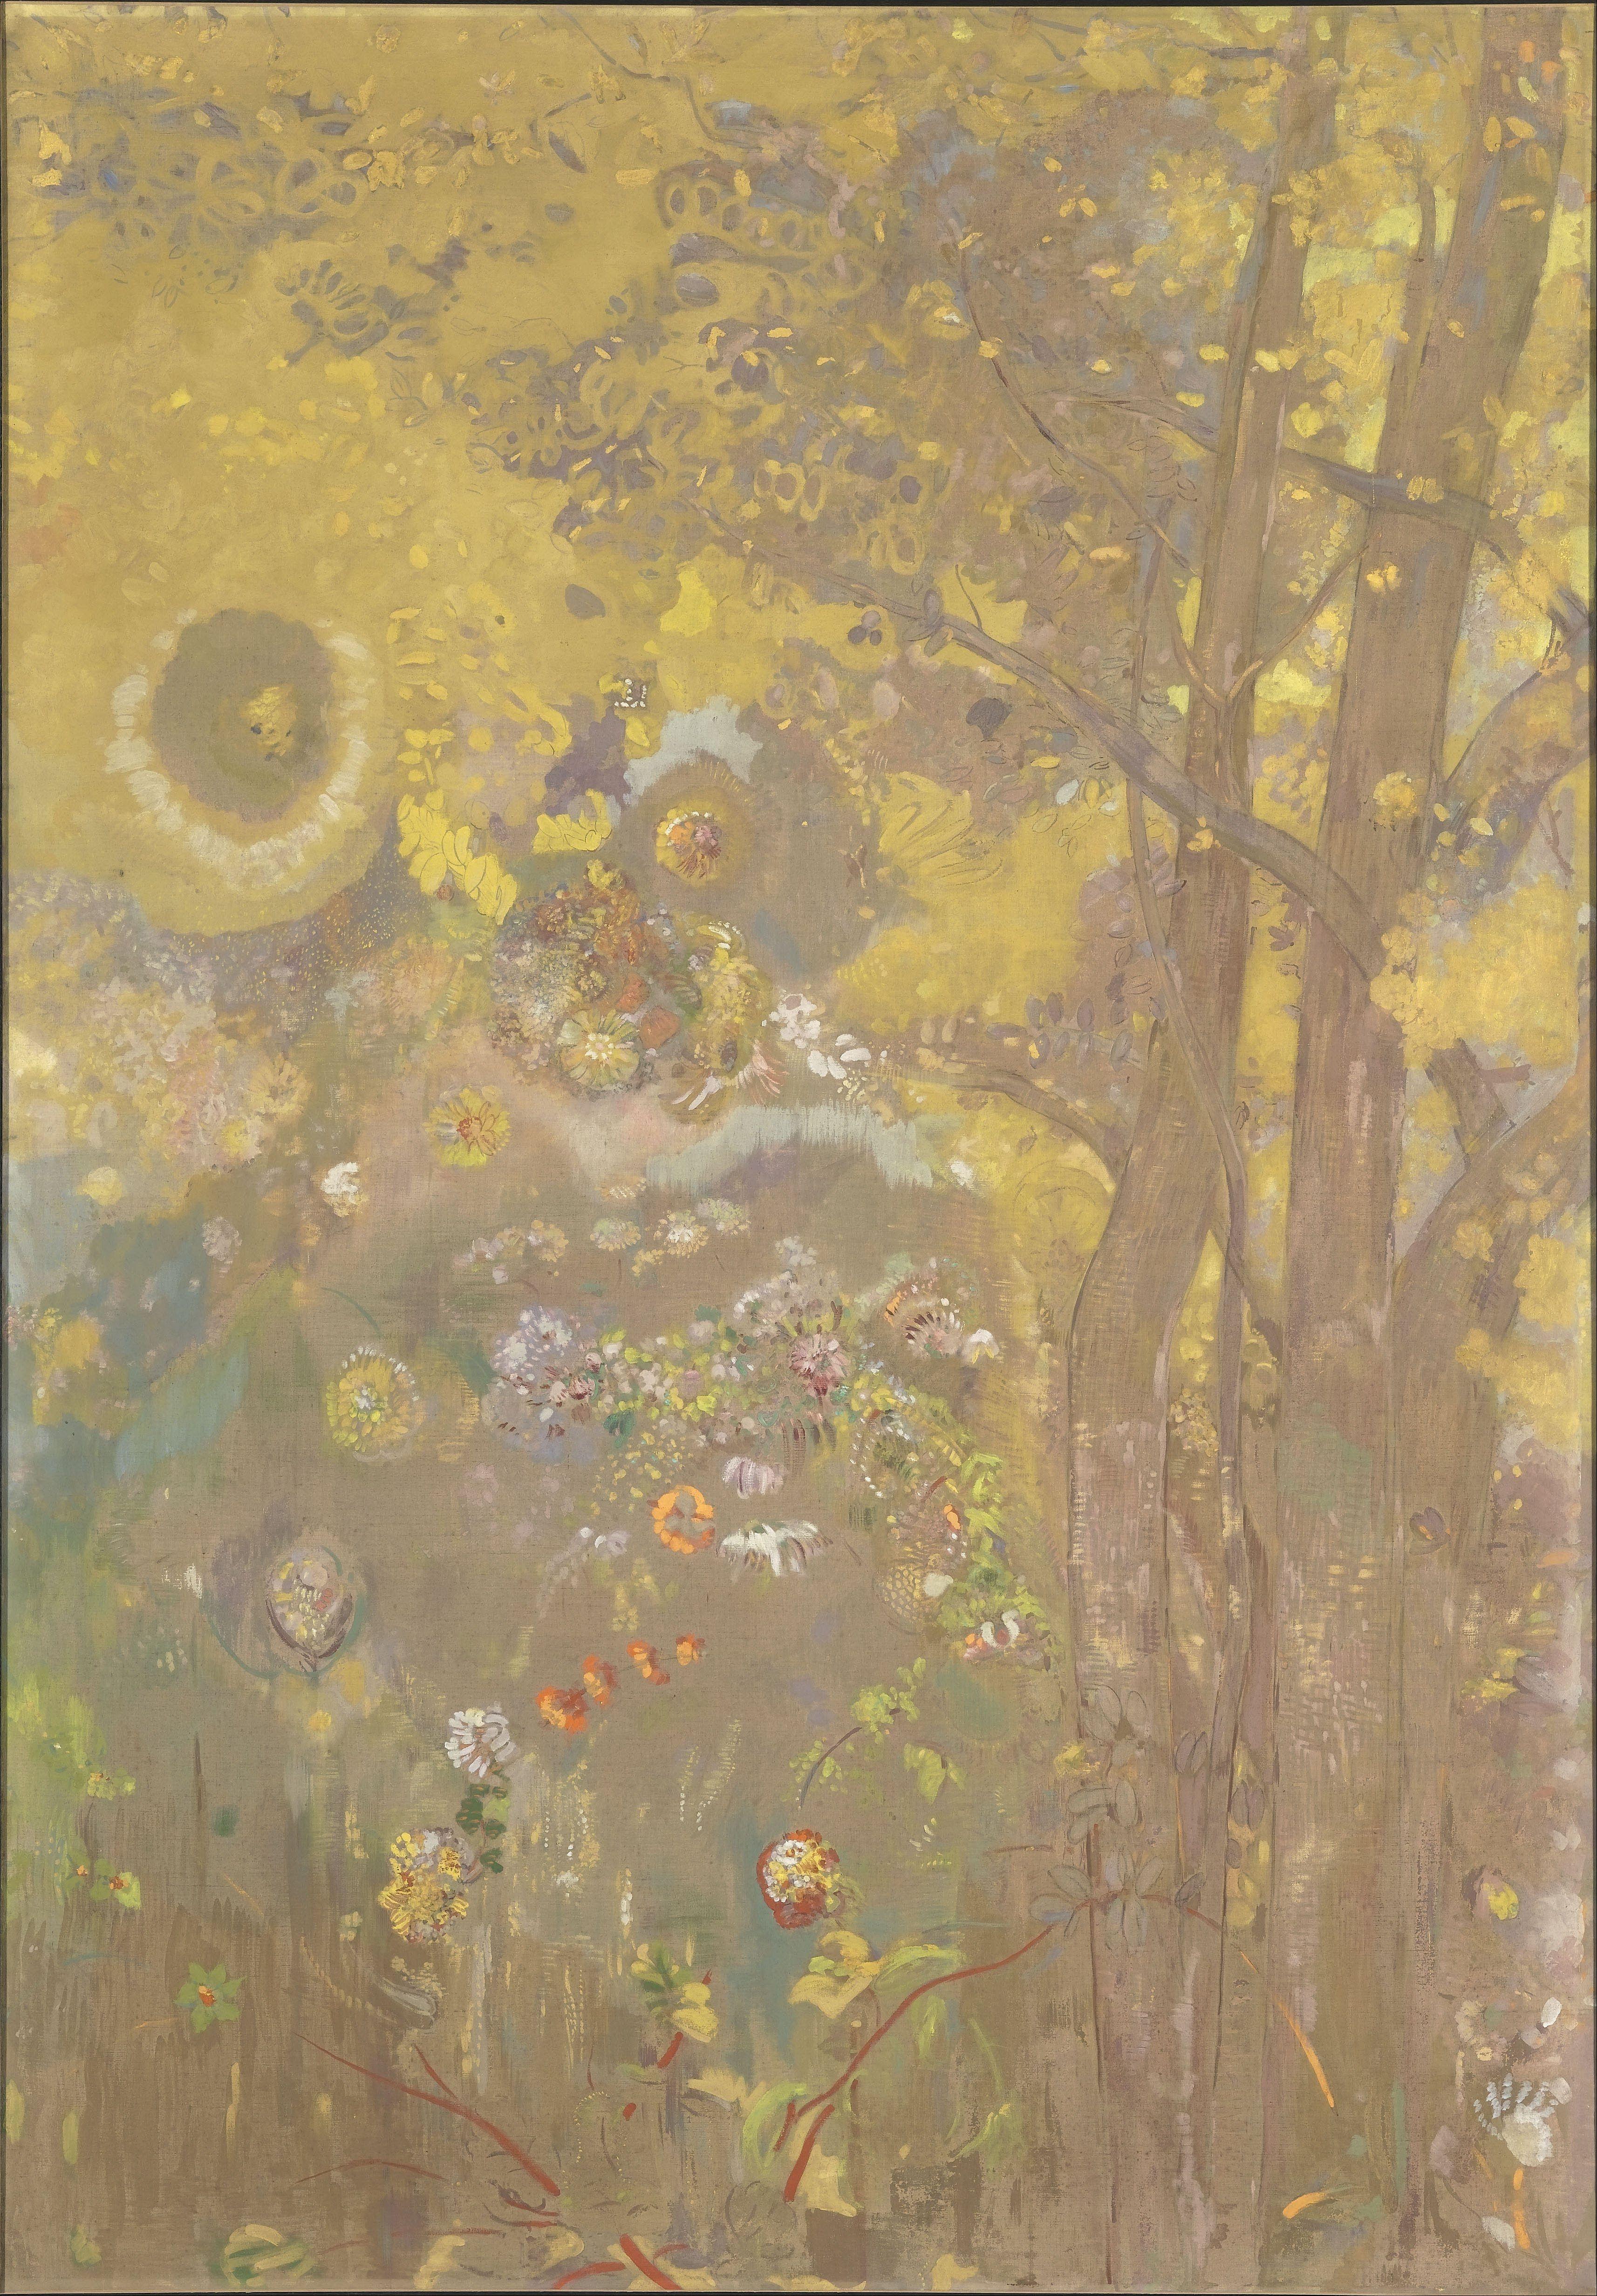 Odilon_Redon_-_Trees_on_a_yellow_Background_-_Google_Art_Project.jpg (3428×4929)